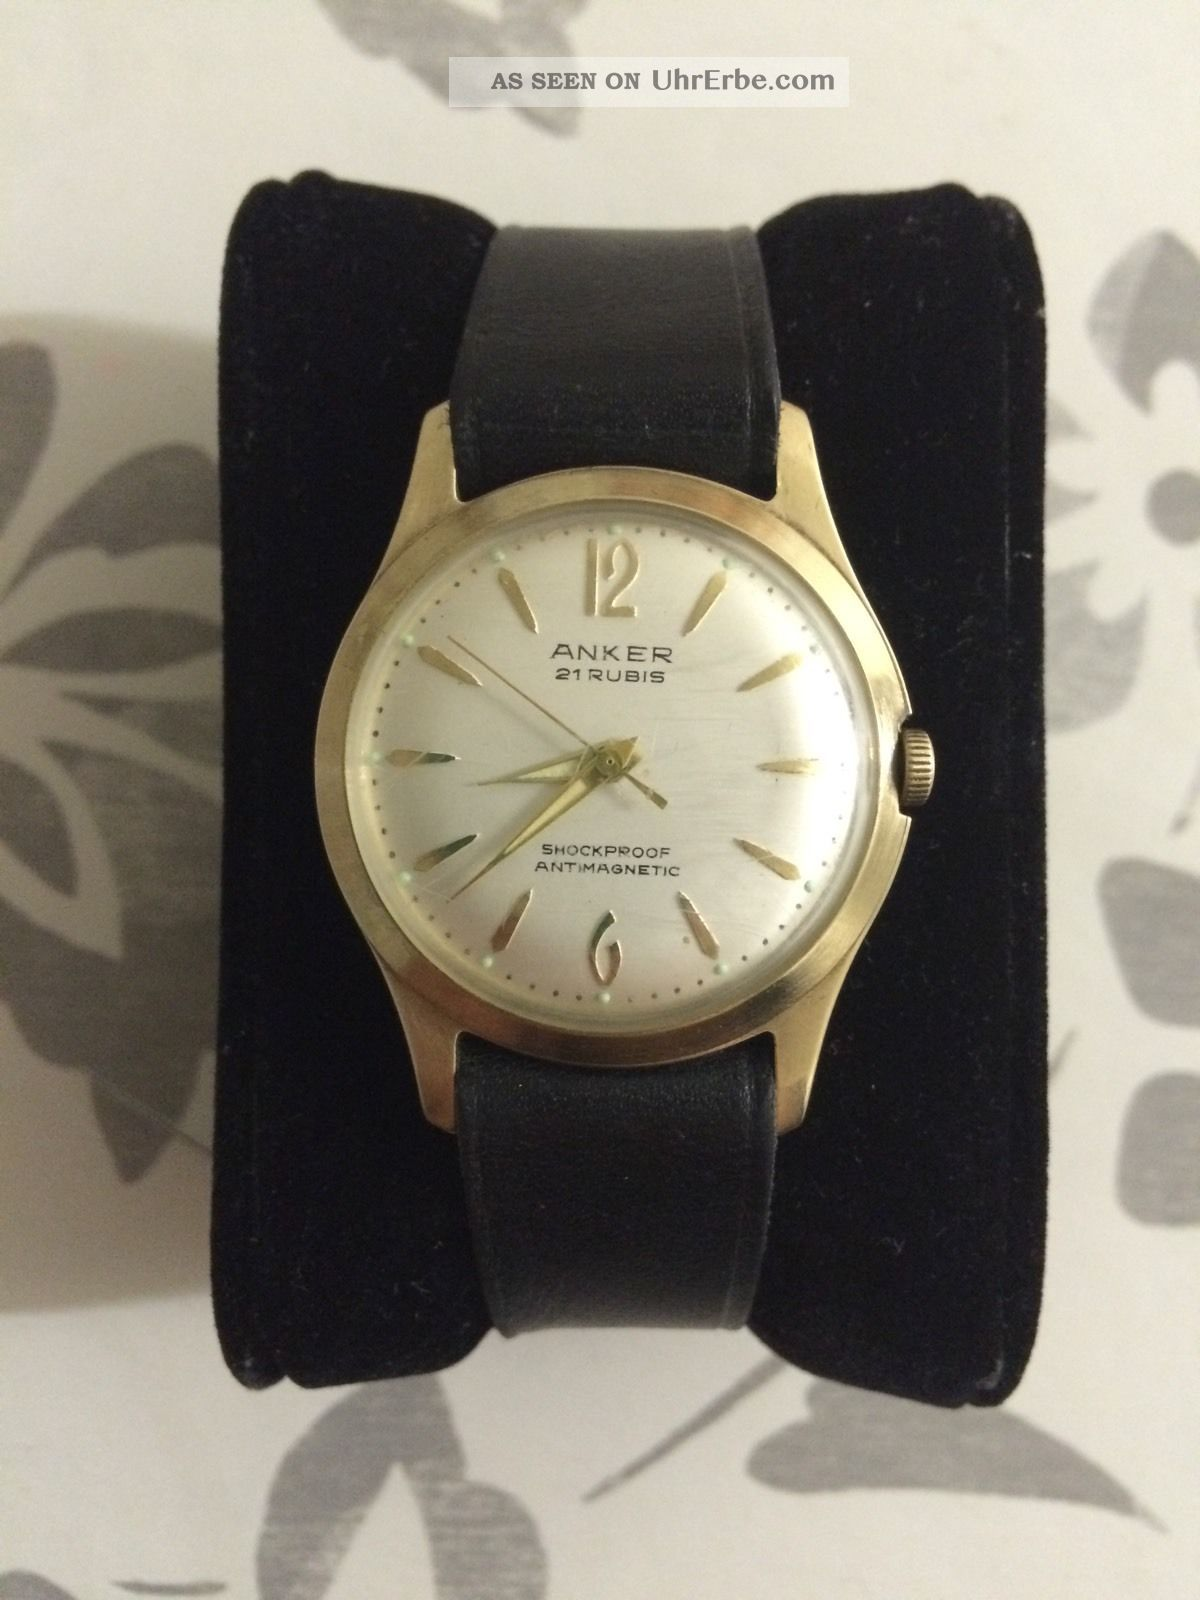 Anker Handaufzug 21rubis (lagersteine) Top Armbanduhren Bild